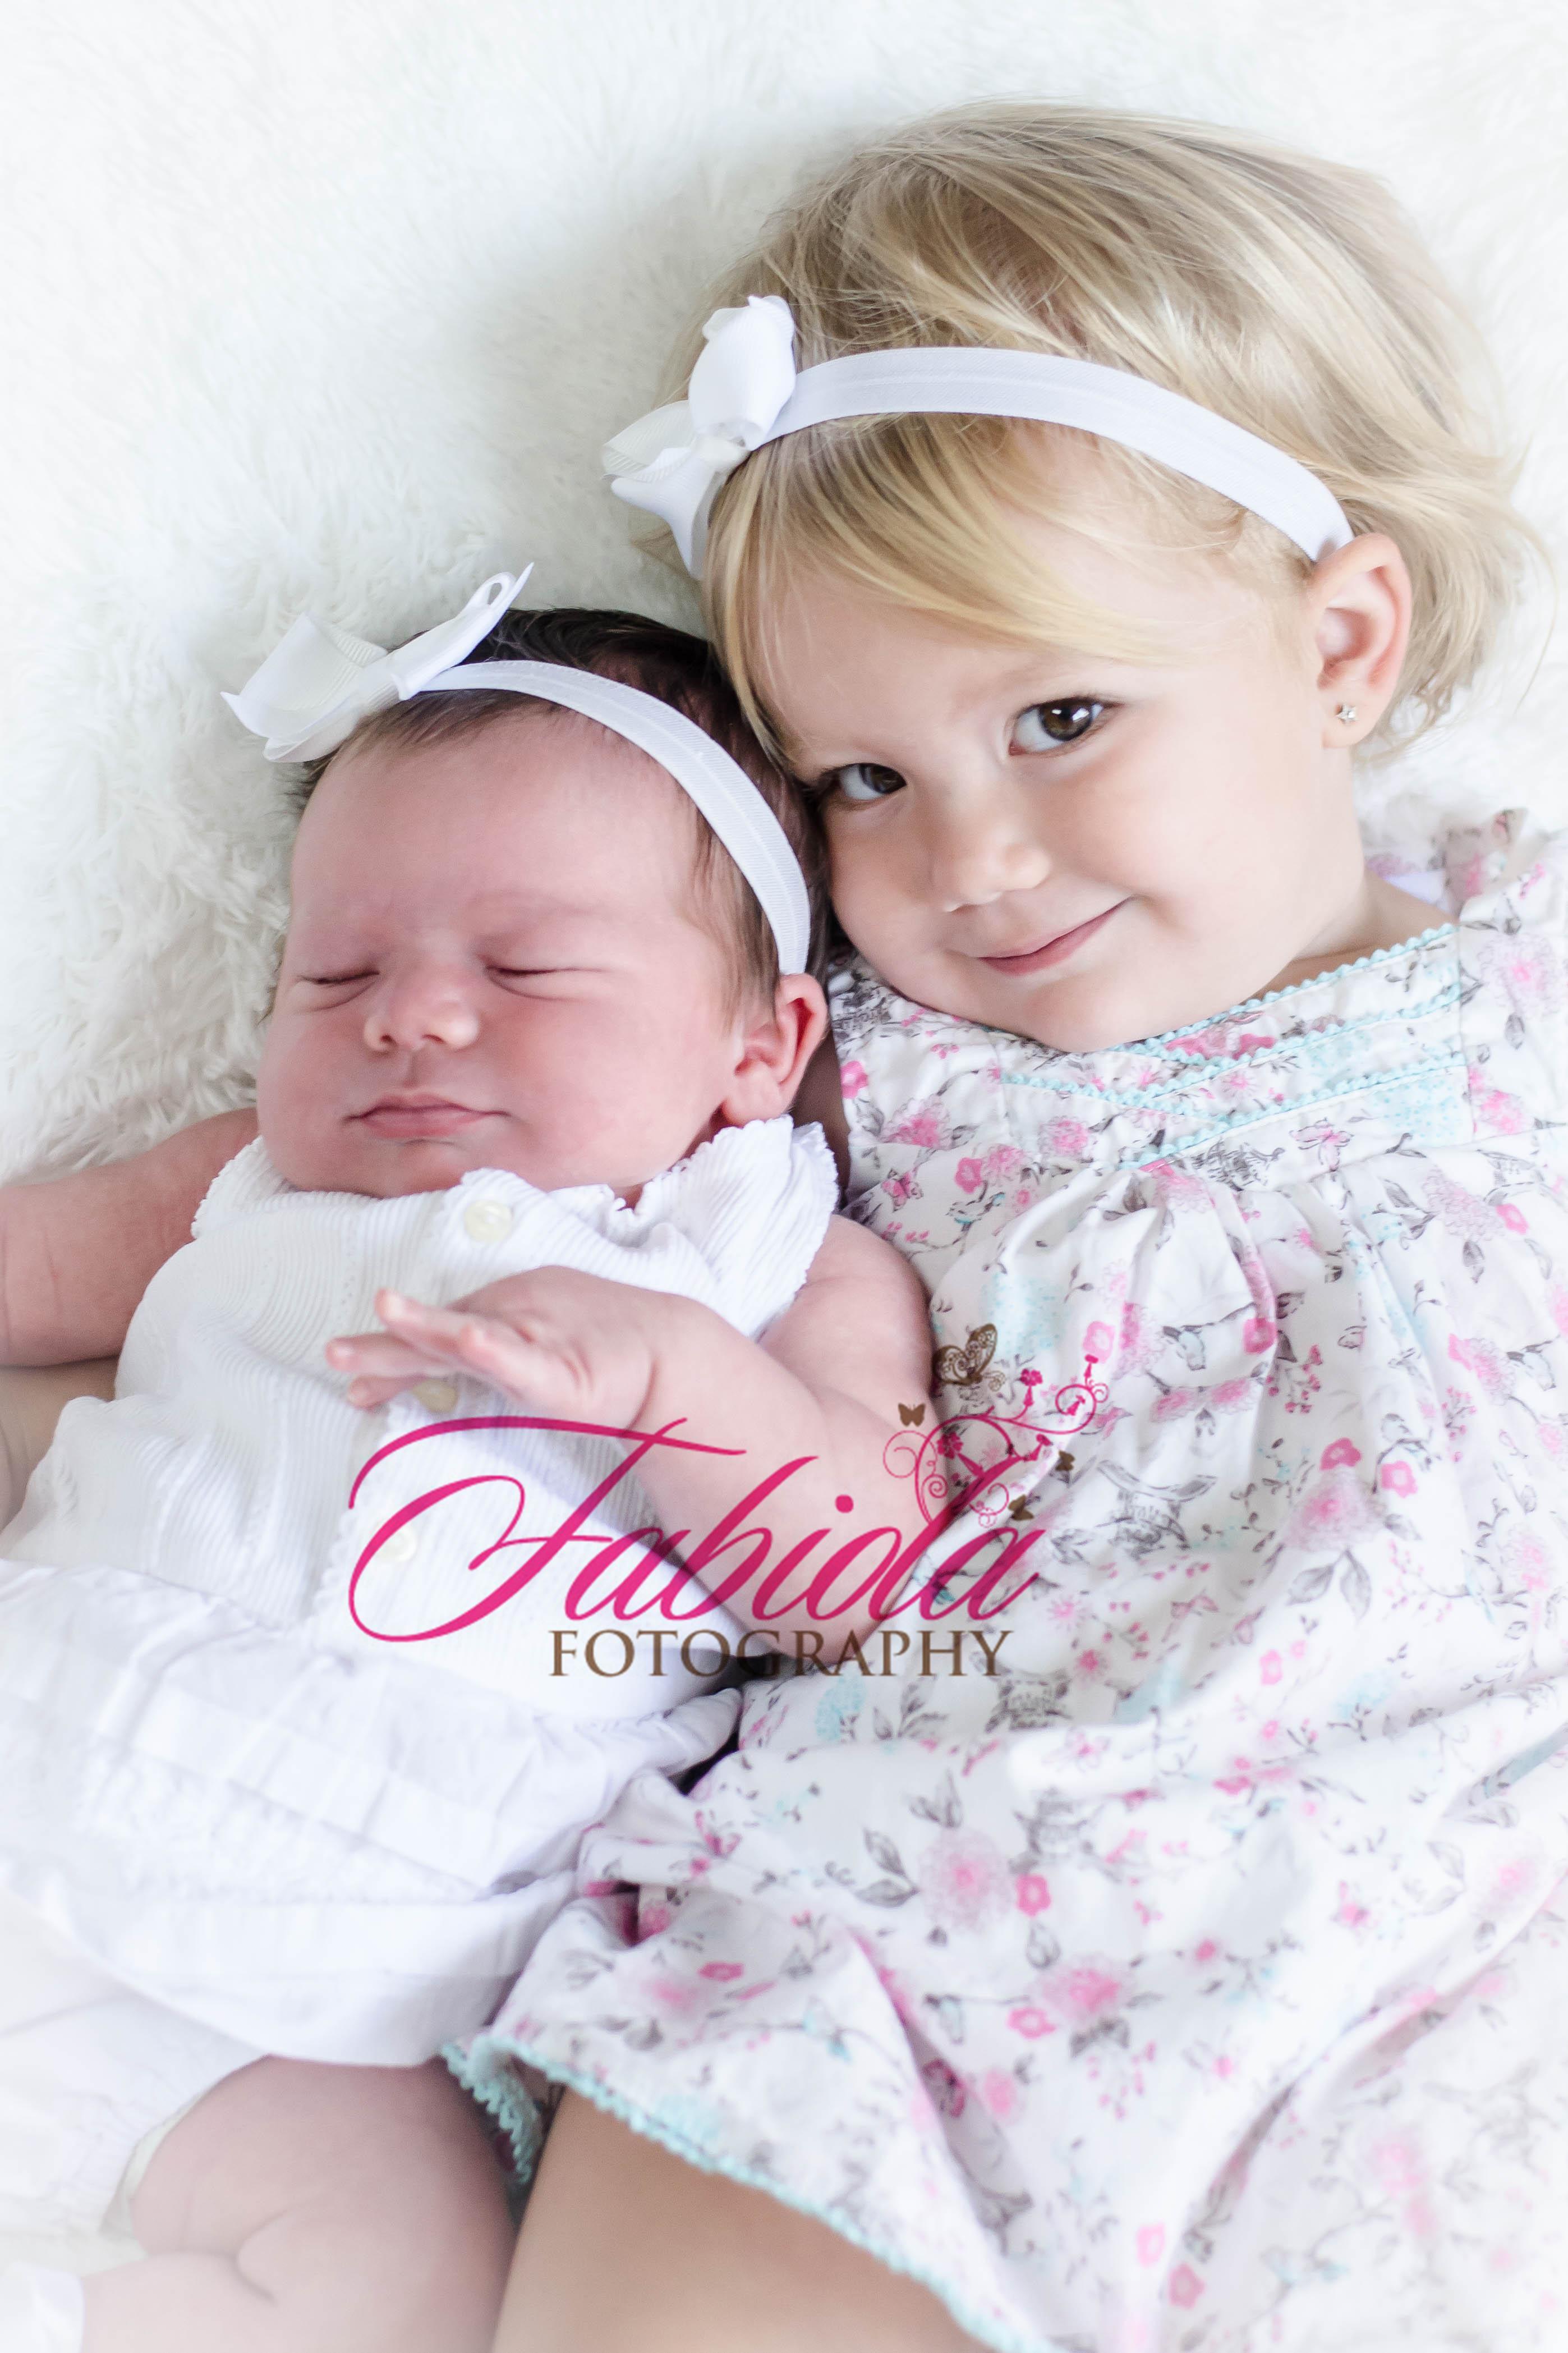 Fabiola Fotography image 31